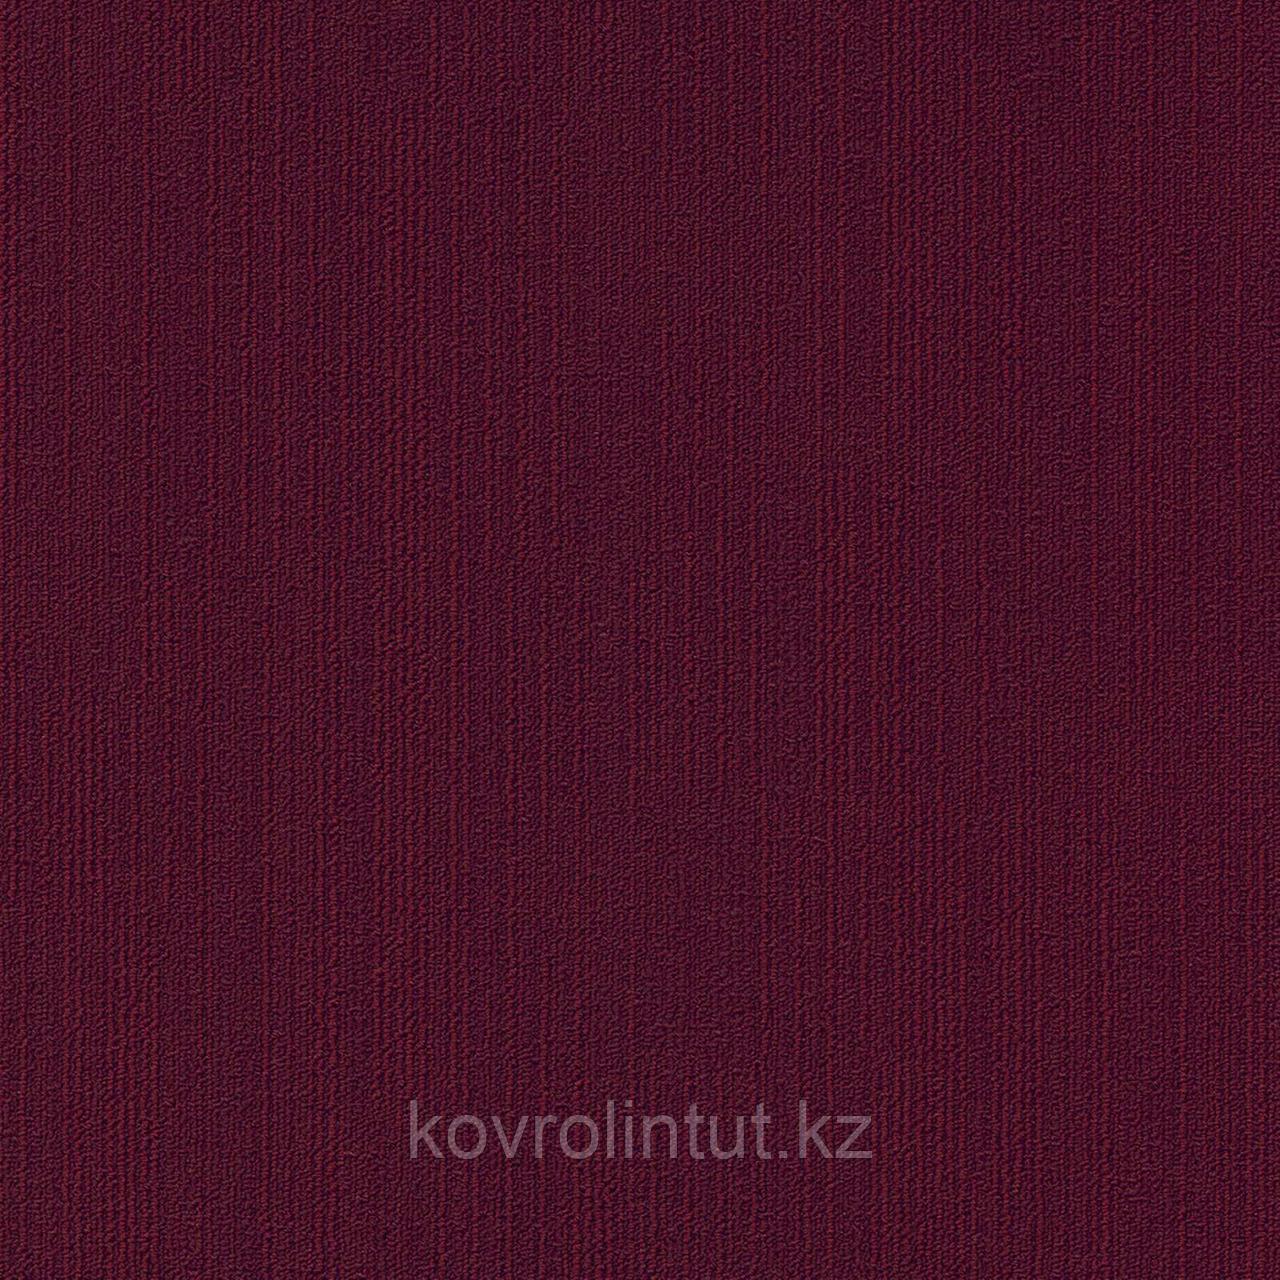 Плитка ковровая Modulyss Fashion& 395, 100% PA